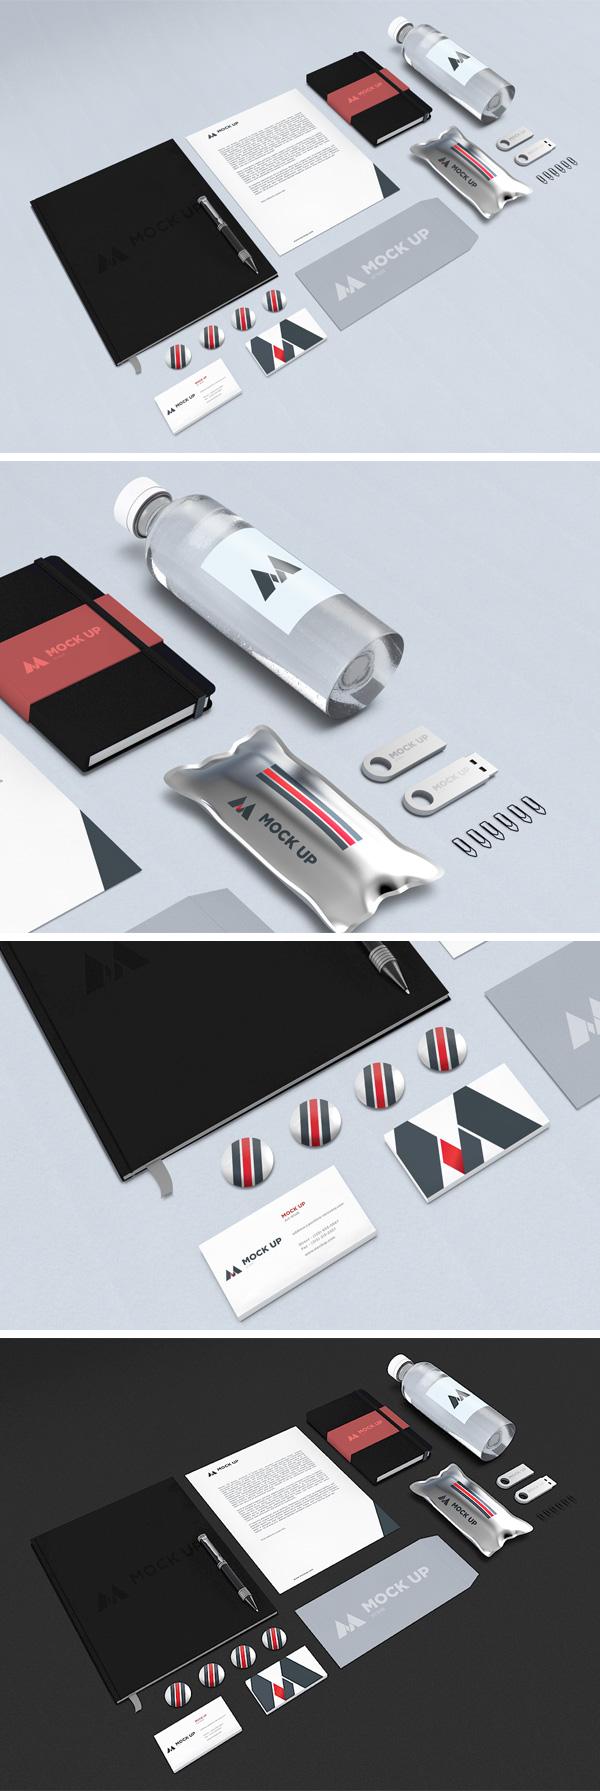 Branding-Identity-Mockup-Vol13-600